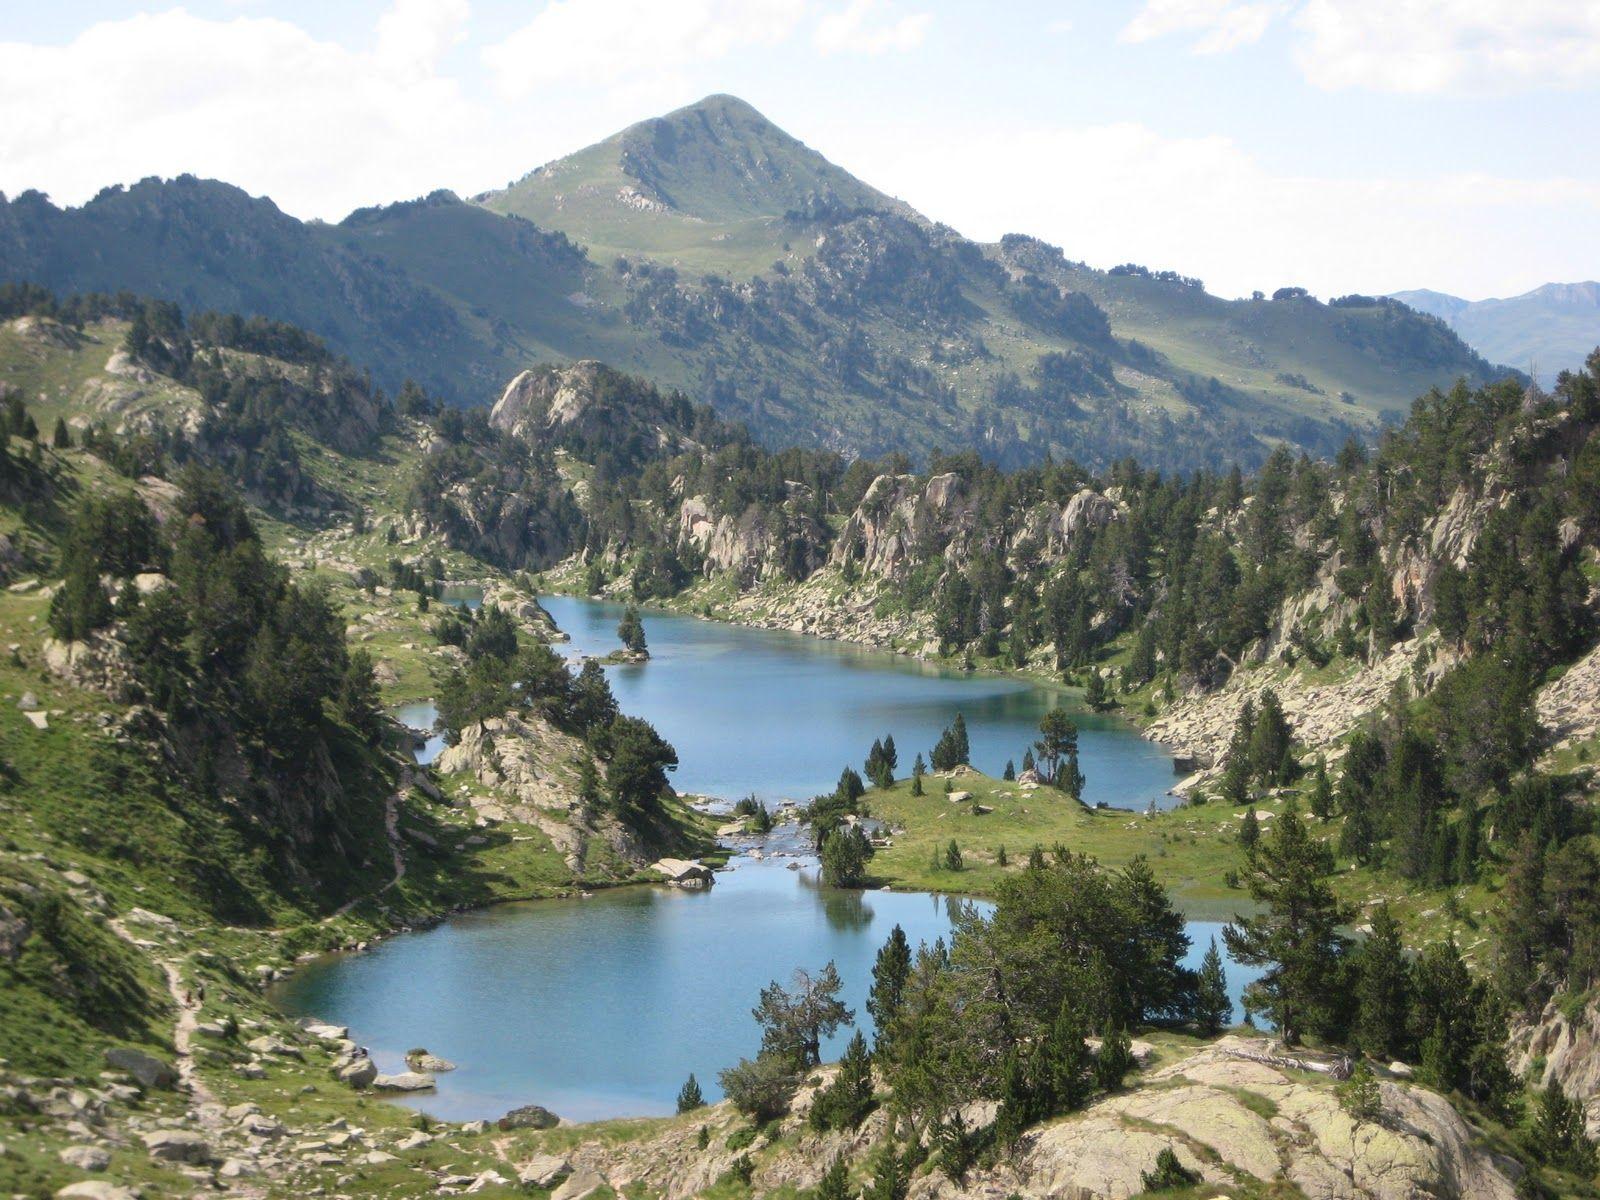 Valle de aran espa a pirineos paisaje increibles - Inmobiliarias valle de aran ...